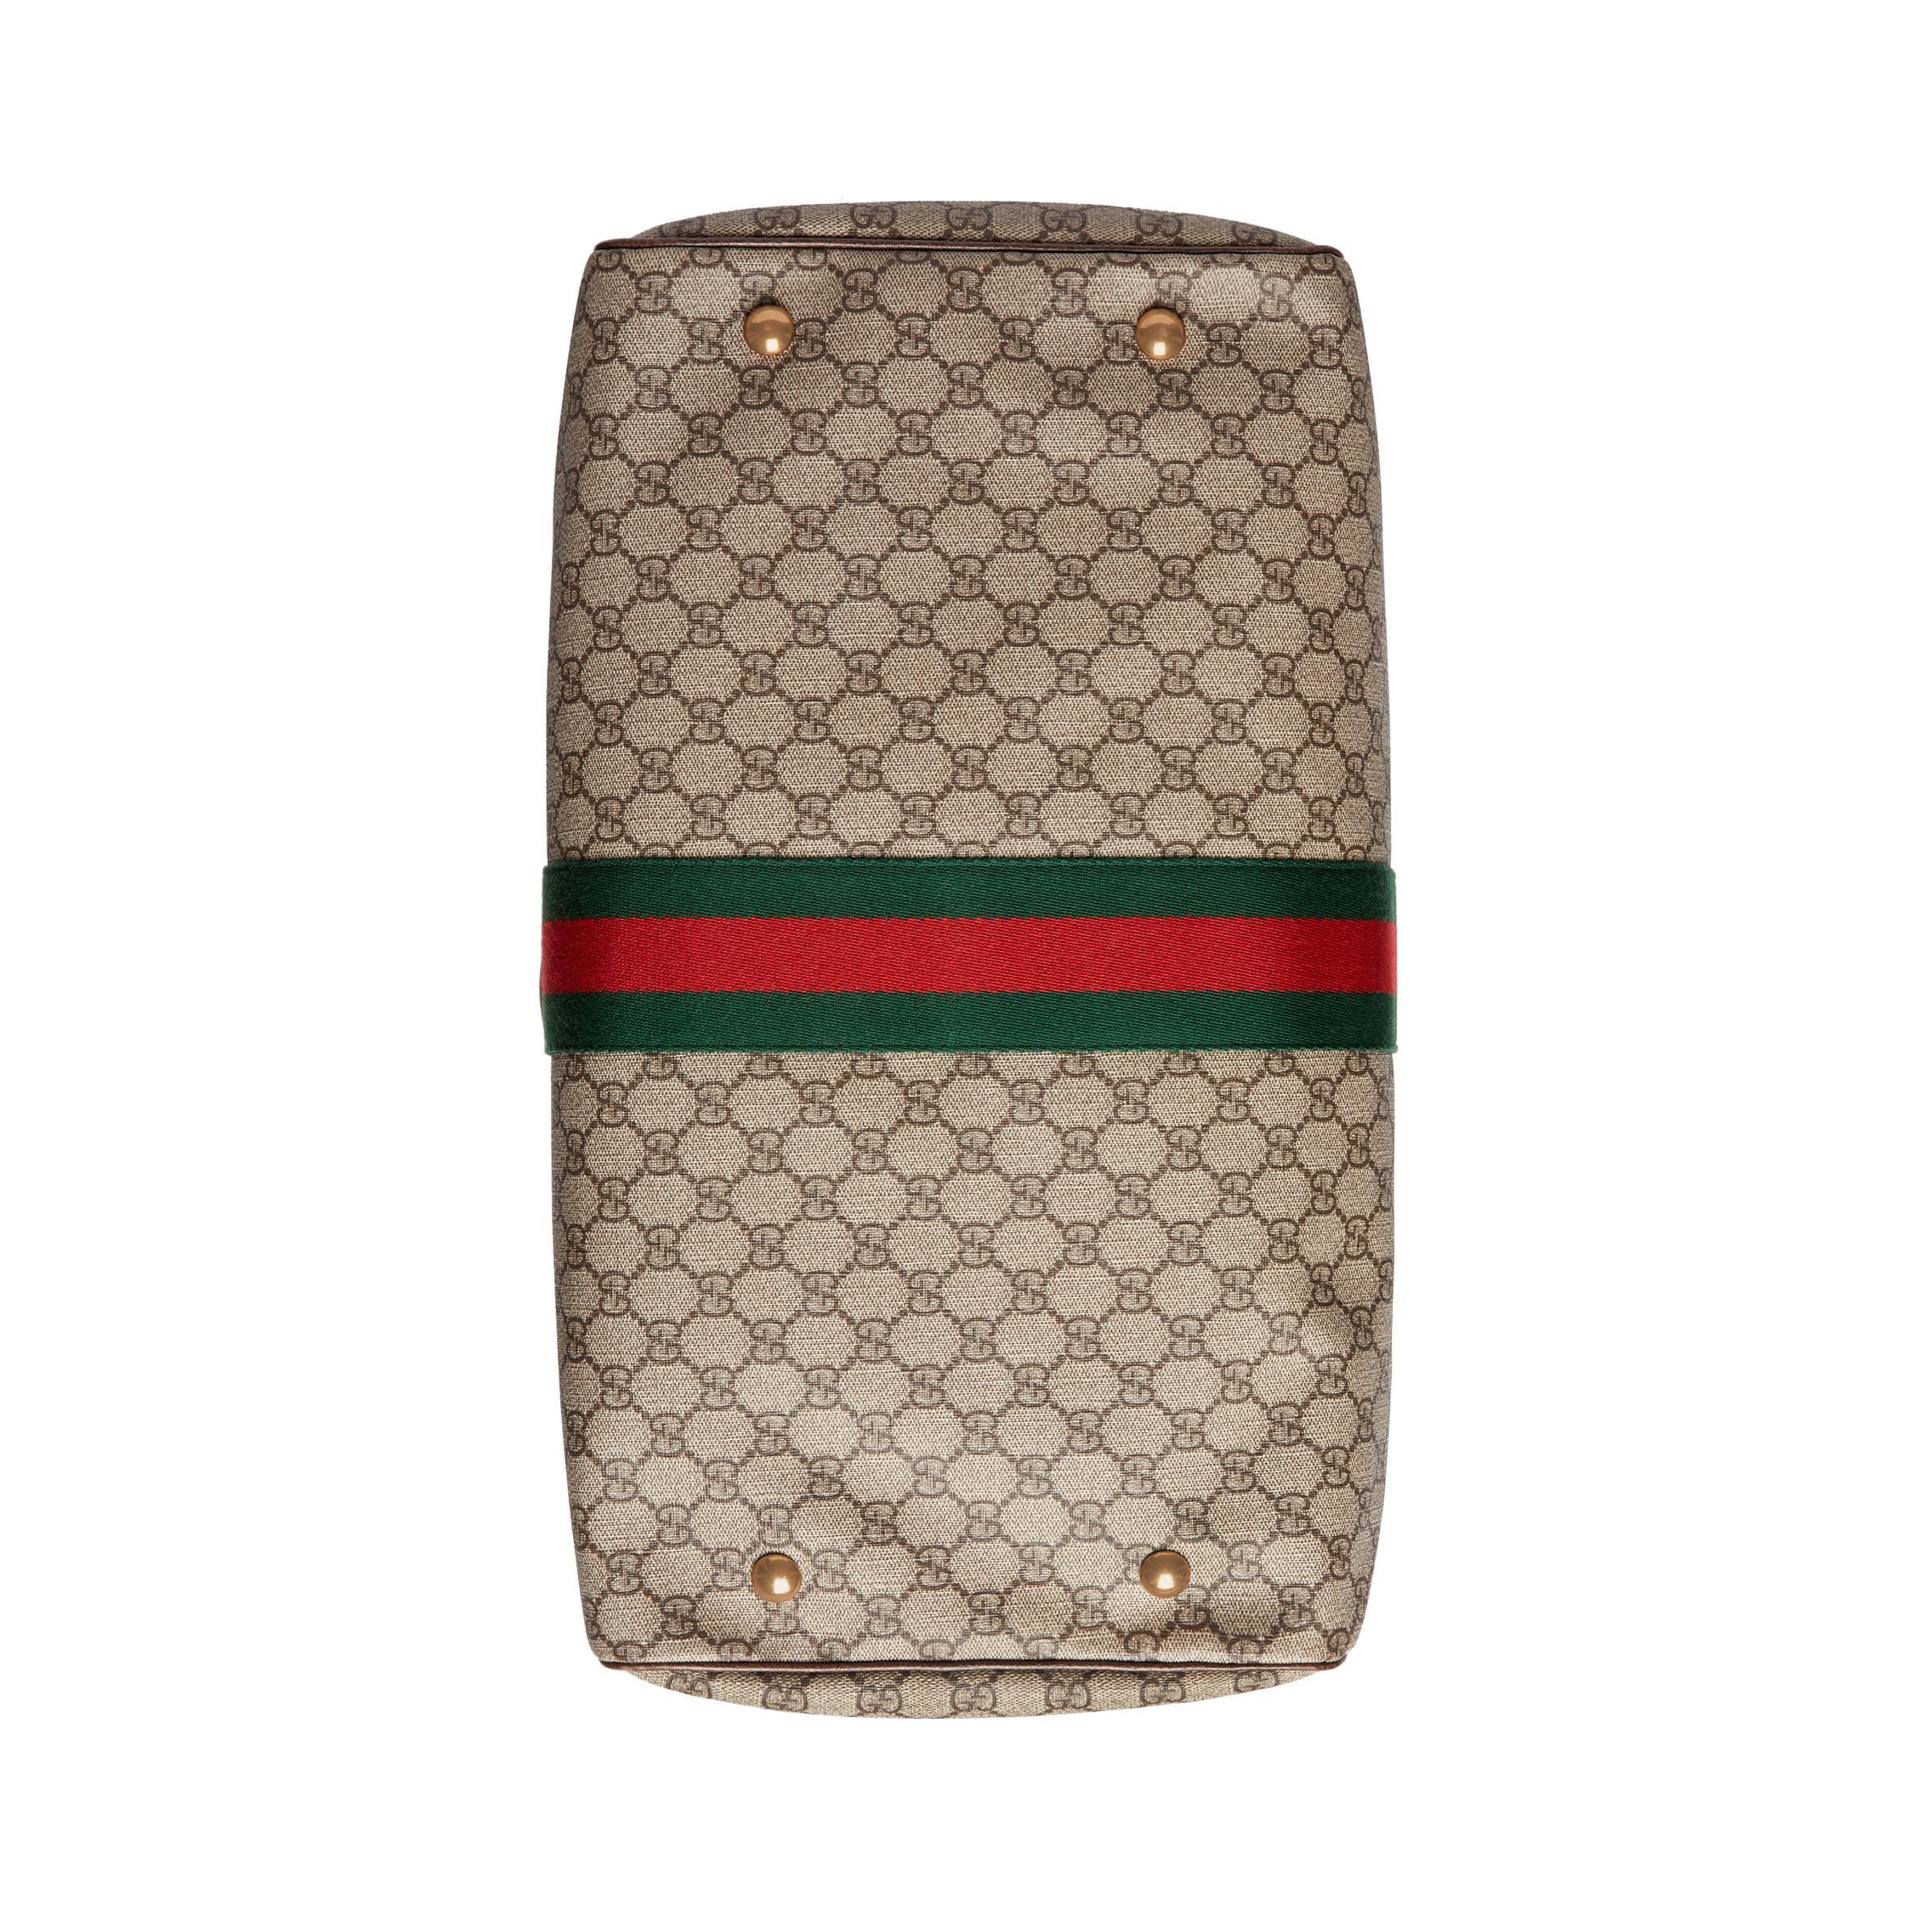 Gucci - Green Ophidia Gg Medium Carry for Men - Lyst. View fullscreen 3af39610ac5